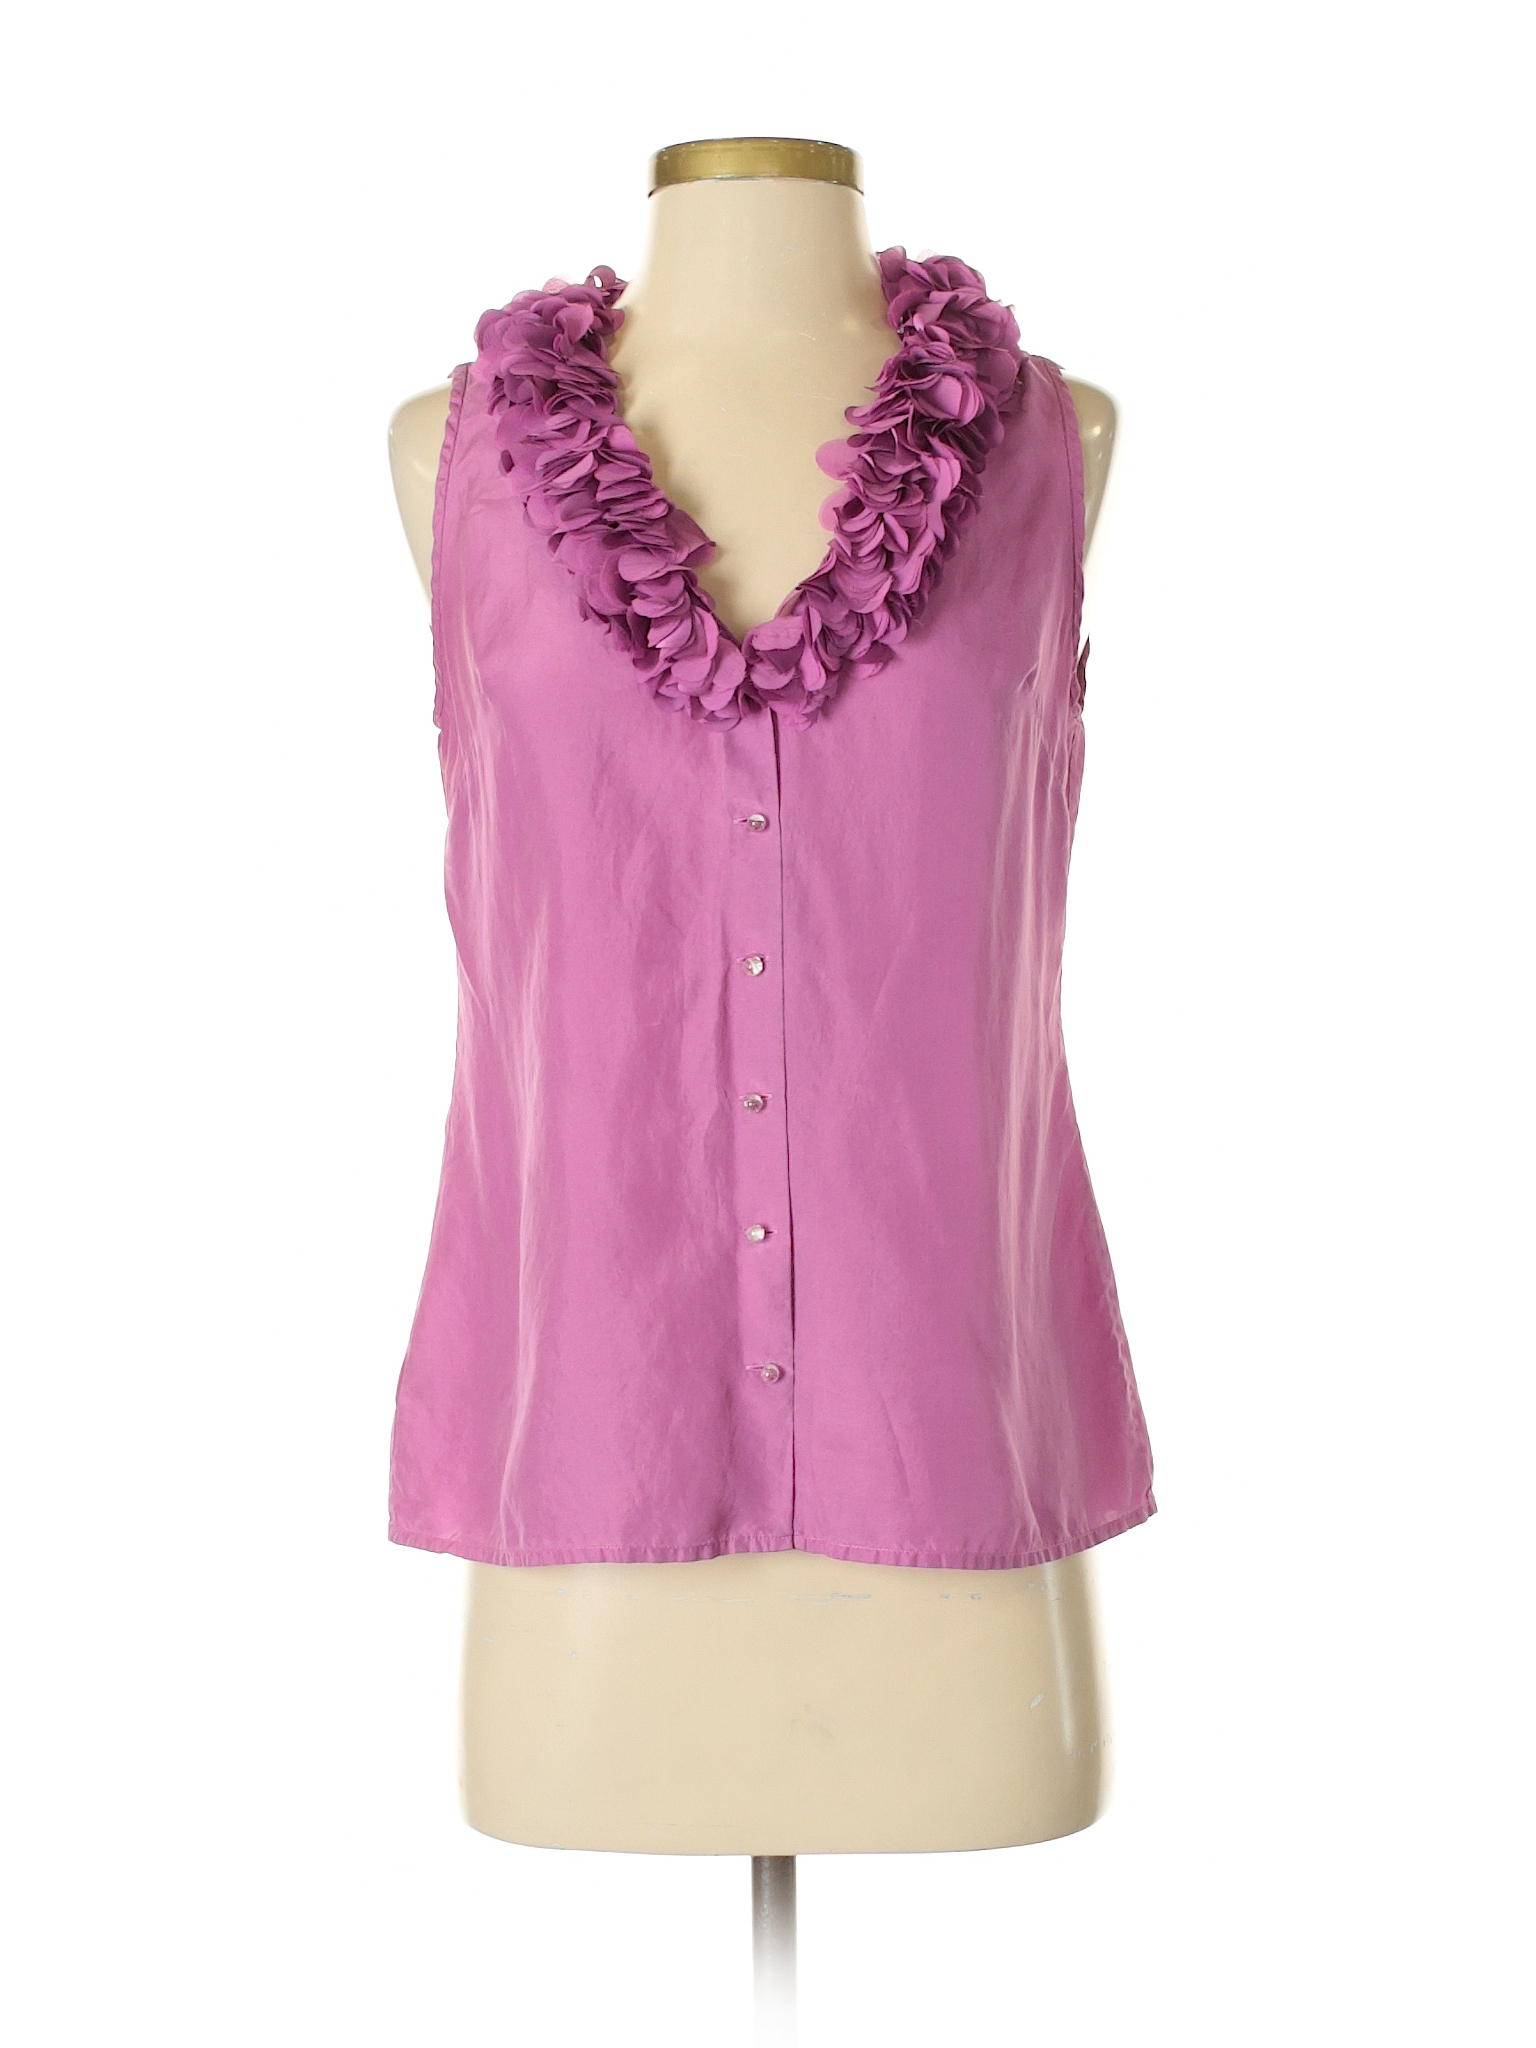 2c87ad7e34c68 Ann Taylor Sleeveless Silk Top  Purple Women s Tops - 32339138